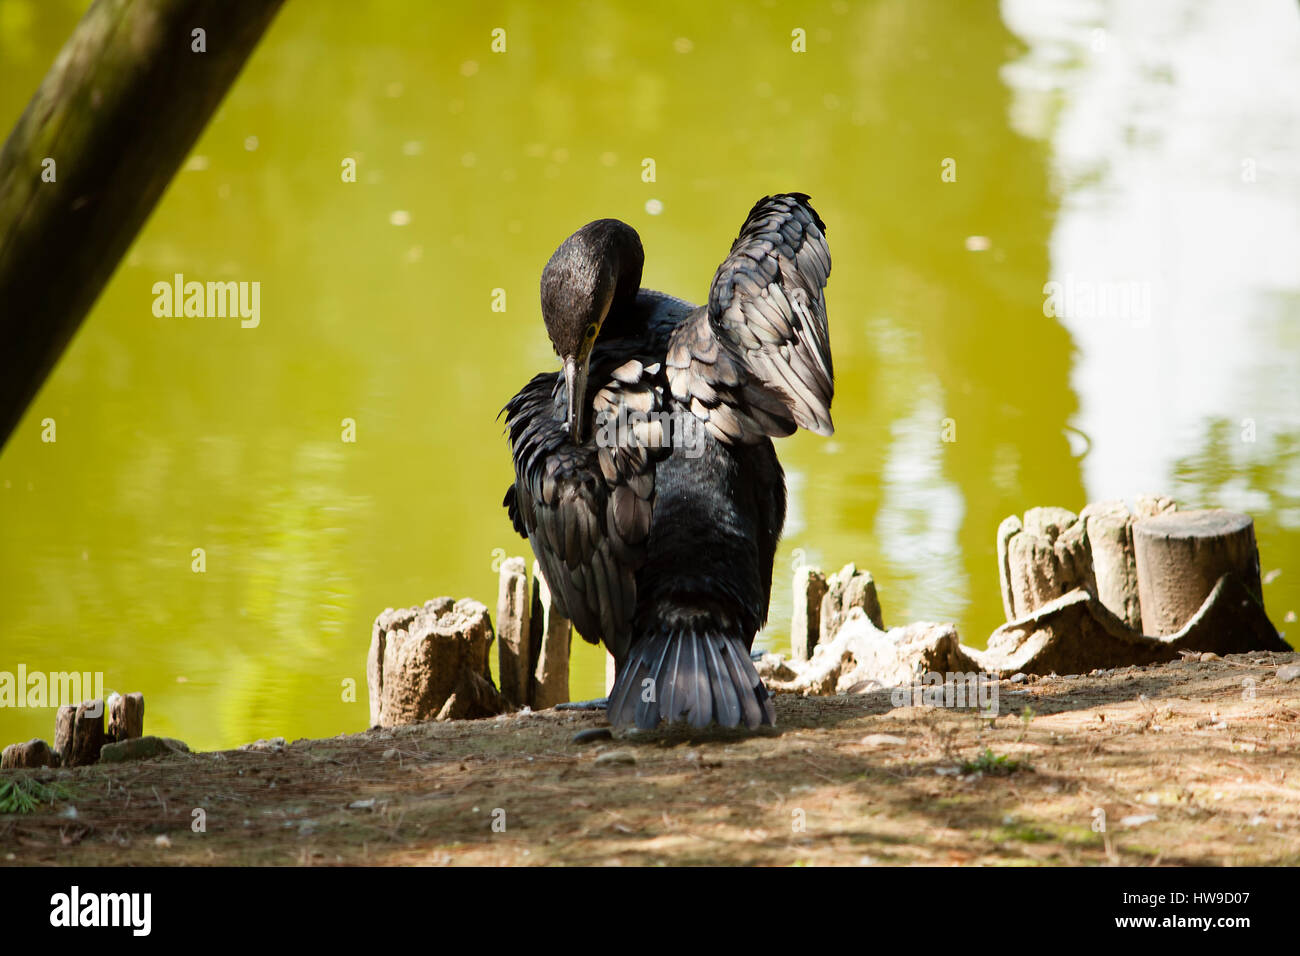 Beste Schwarze Drahtspeicherwürfel 10x16 Fotos - Schaltplan Serie ...